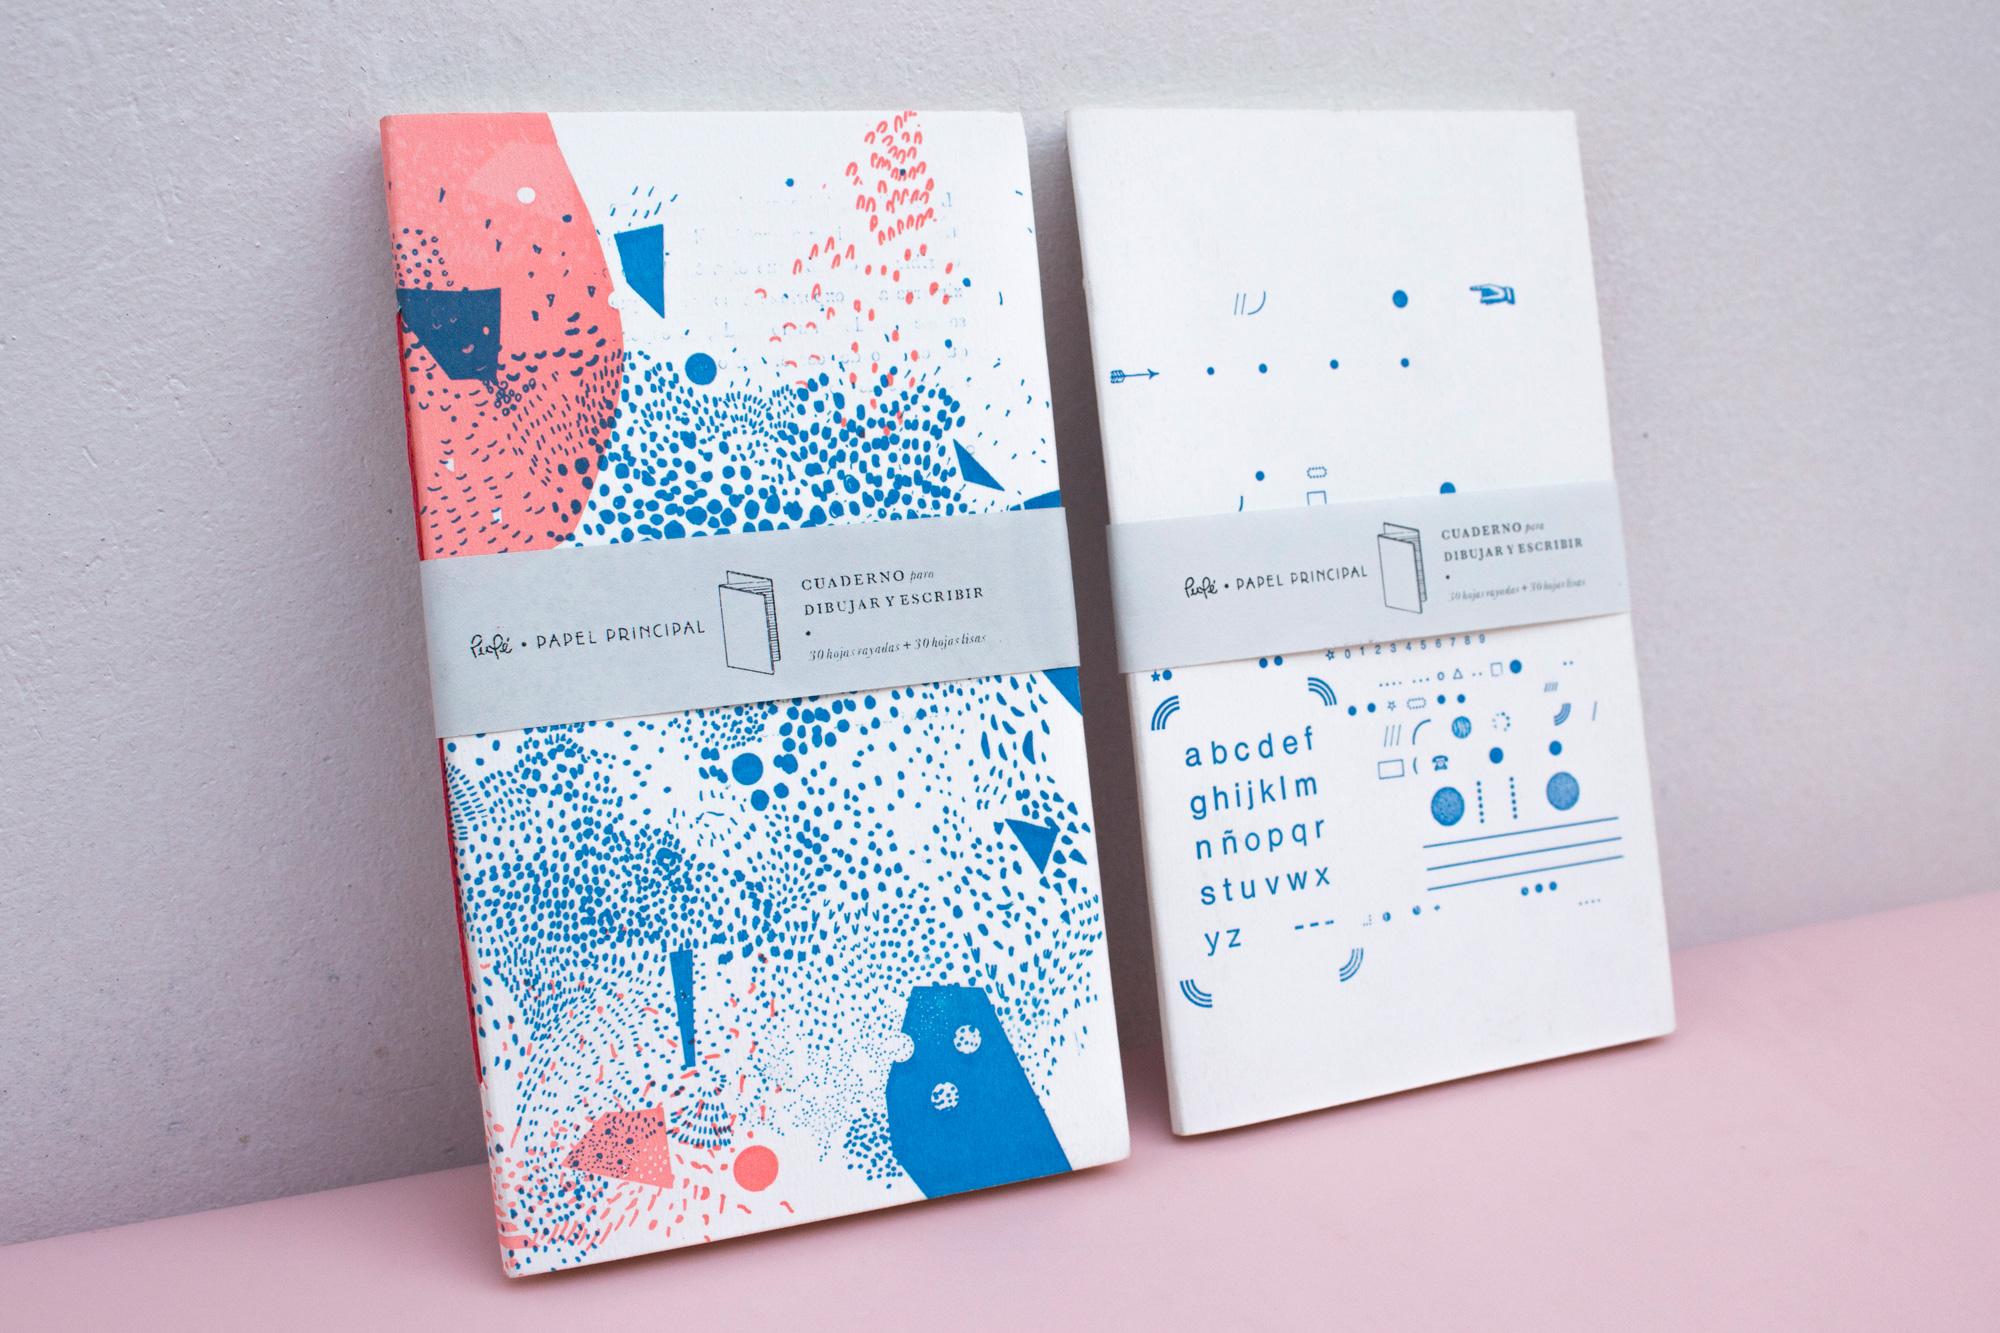 2-dibujar-escribir-pupe-cuaderno-zigzag-papel-principal-letterpress-imprenta-tipografica-artesanal.jpg